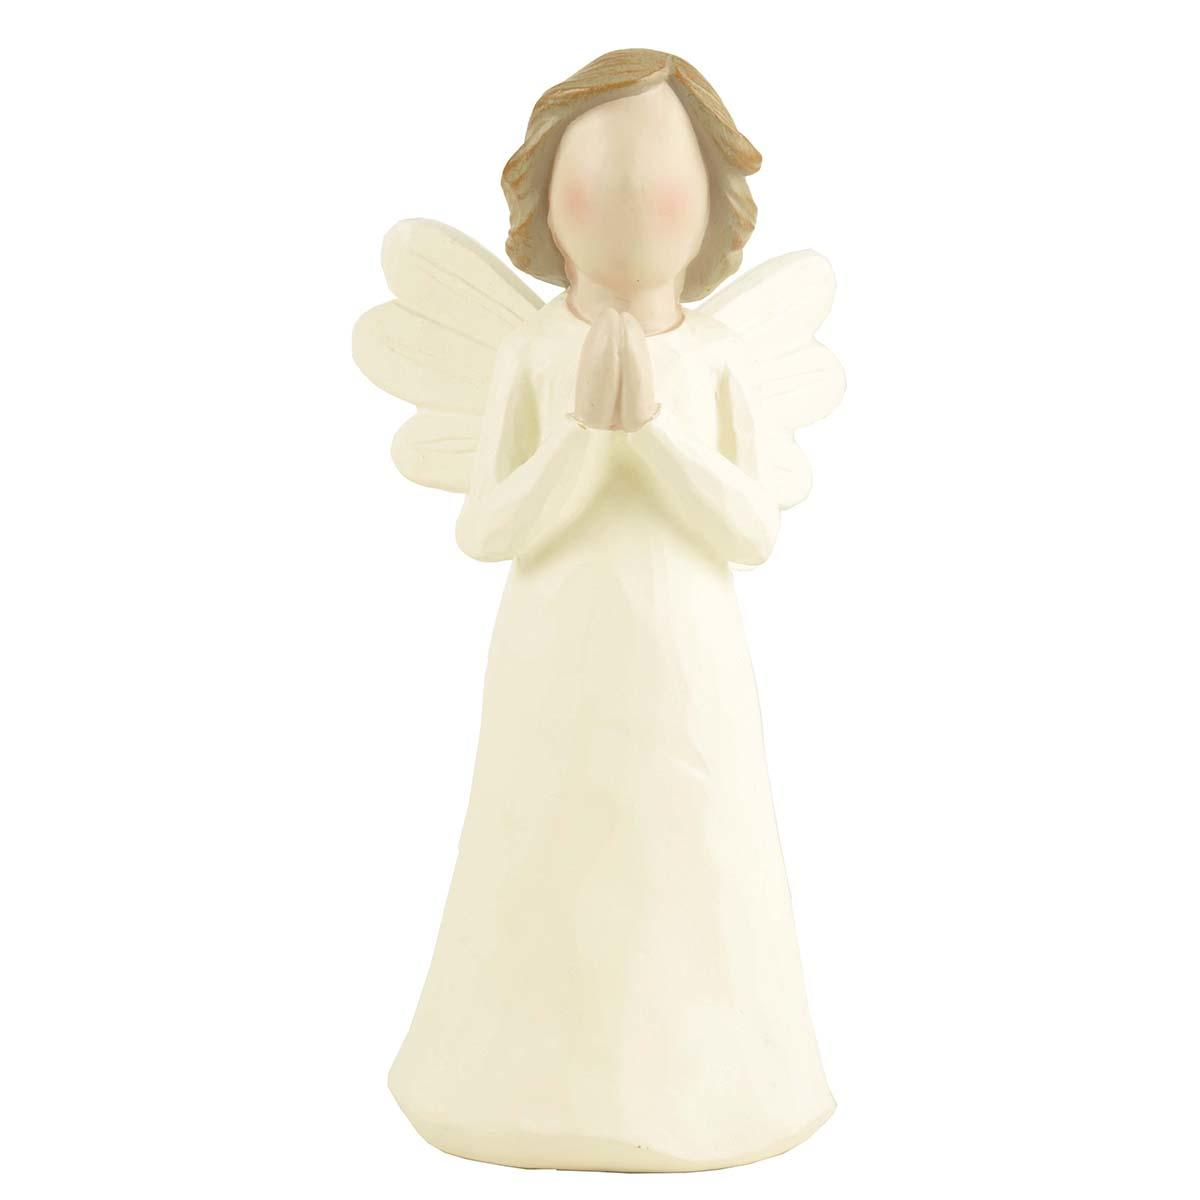 Ennas carved angel figurine top-selling at discount